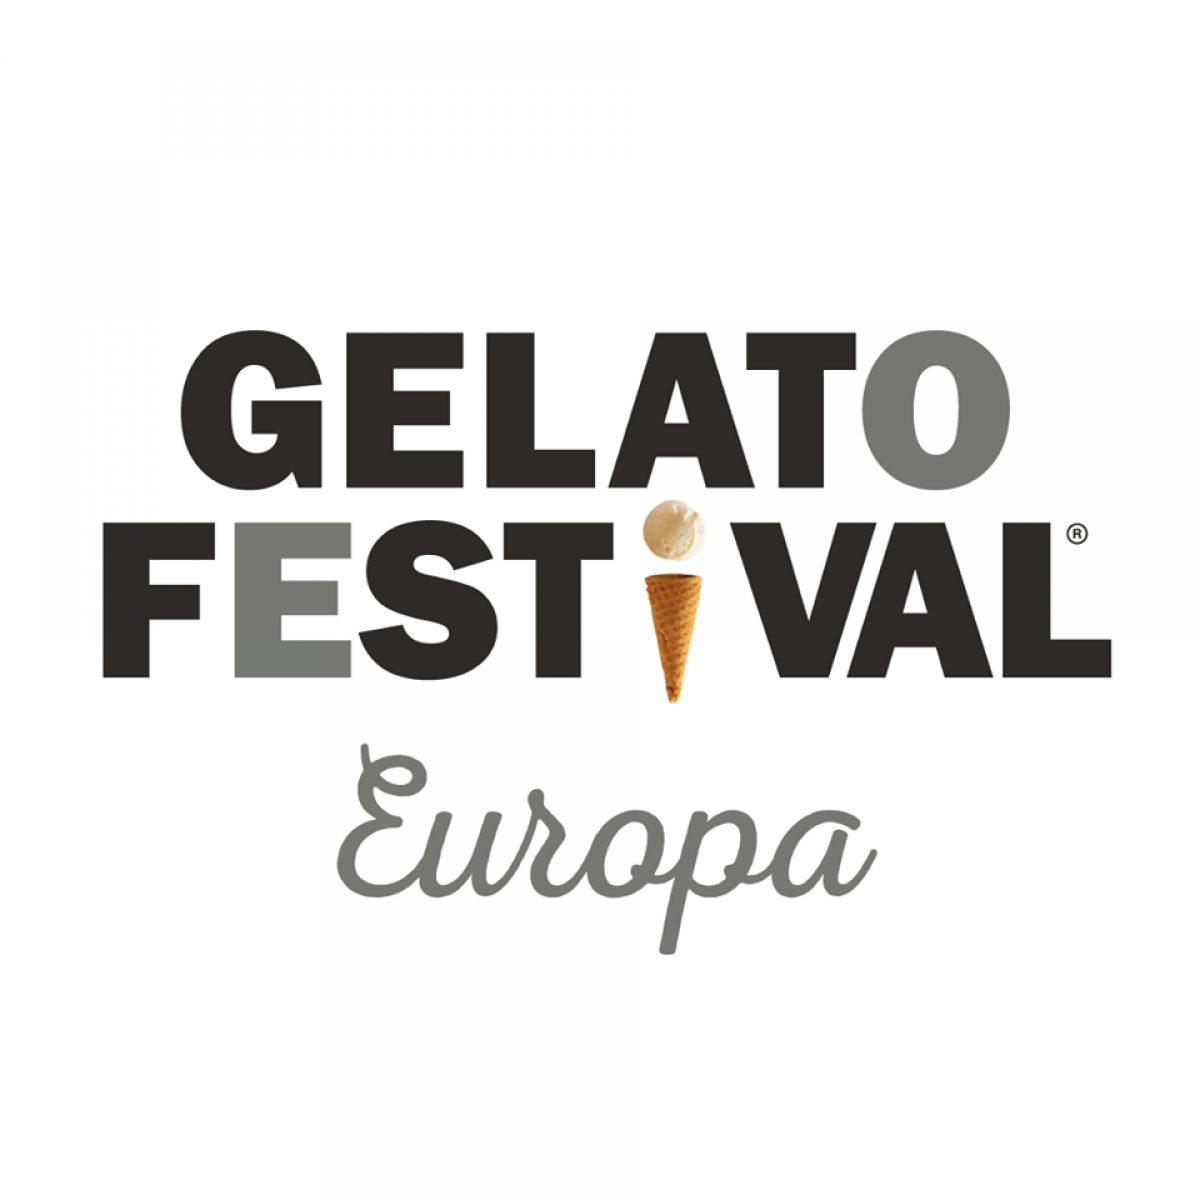 Gelato Festival - All Star a Firenze